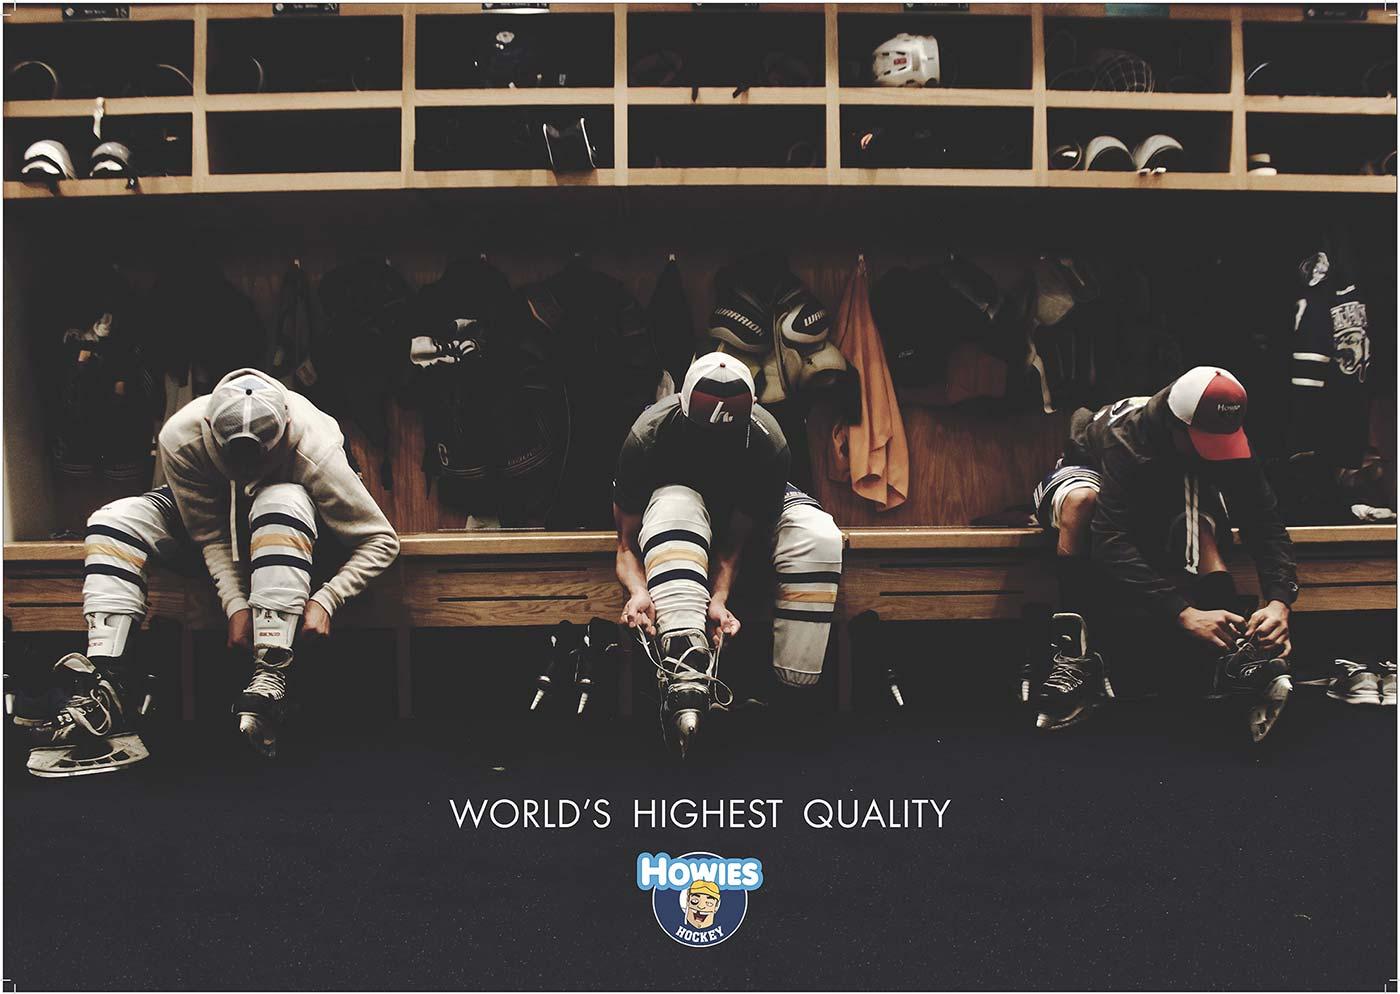 Howies - Hockey